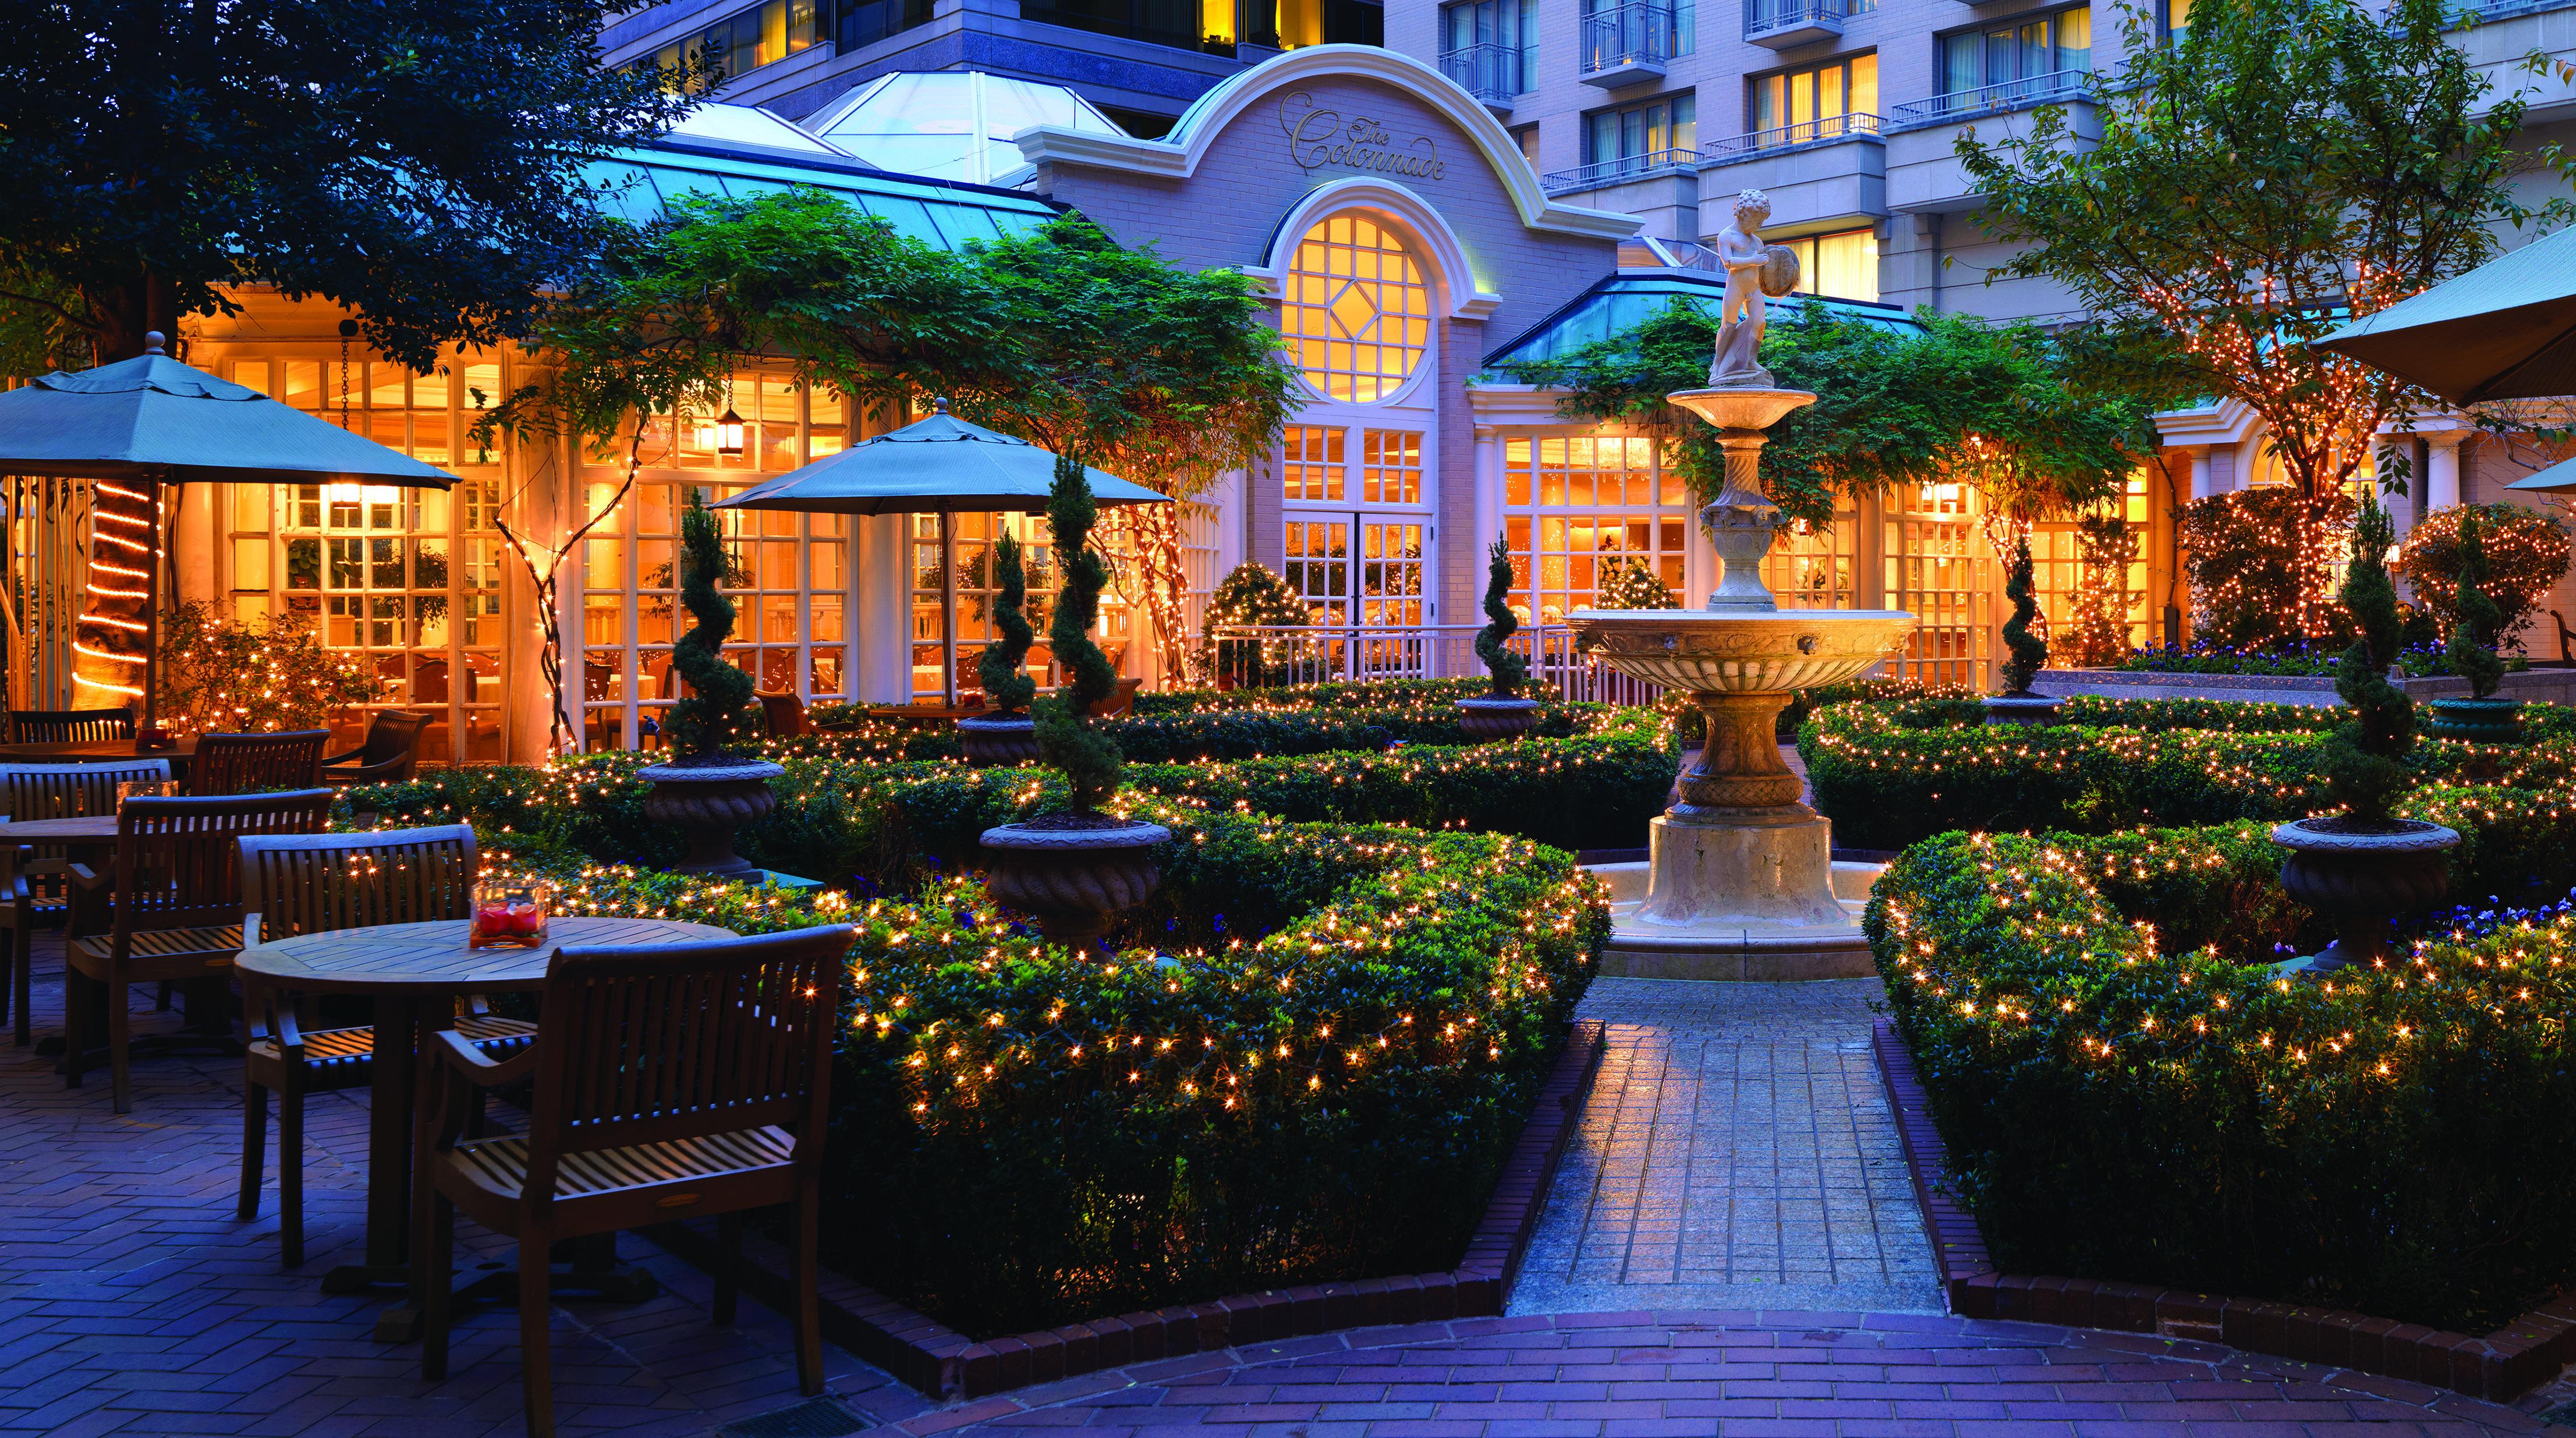 Fairmont washington dc love the courtyard at night